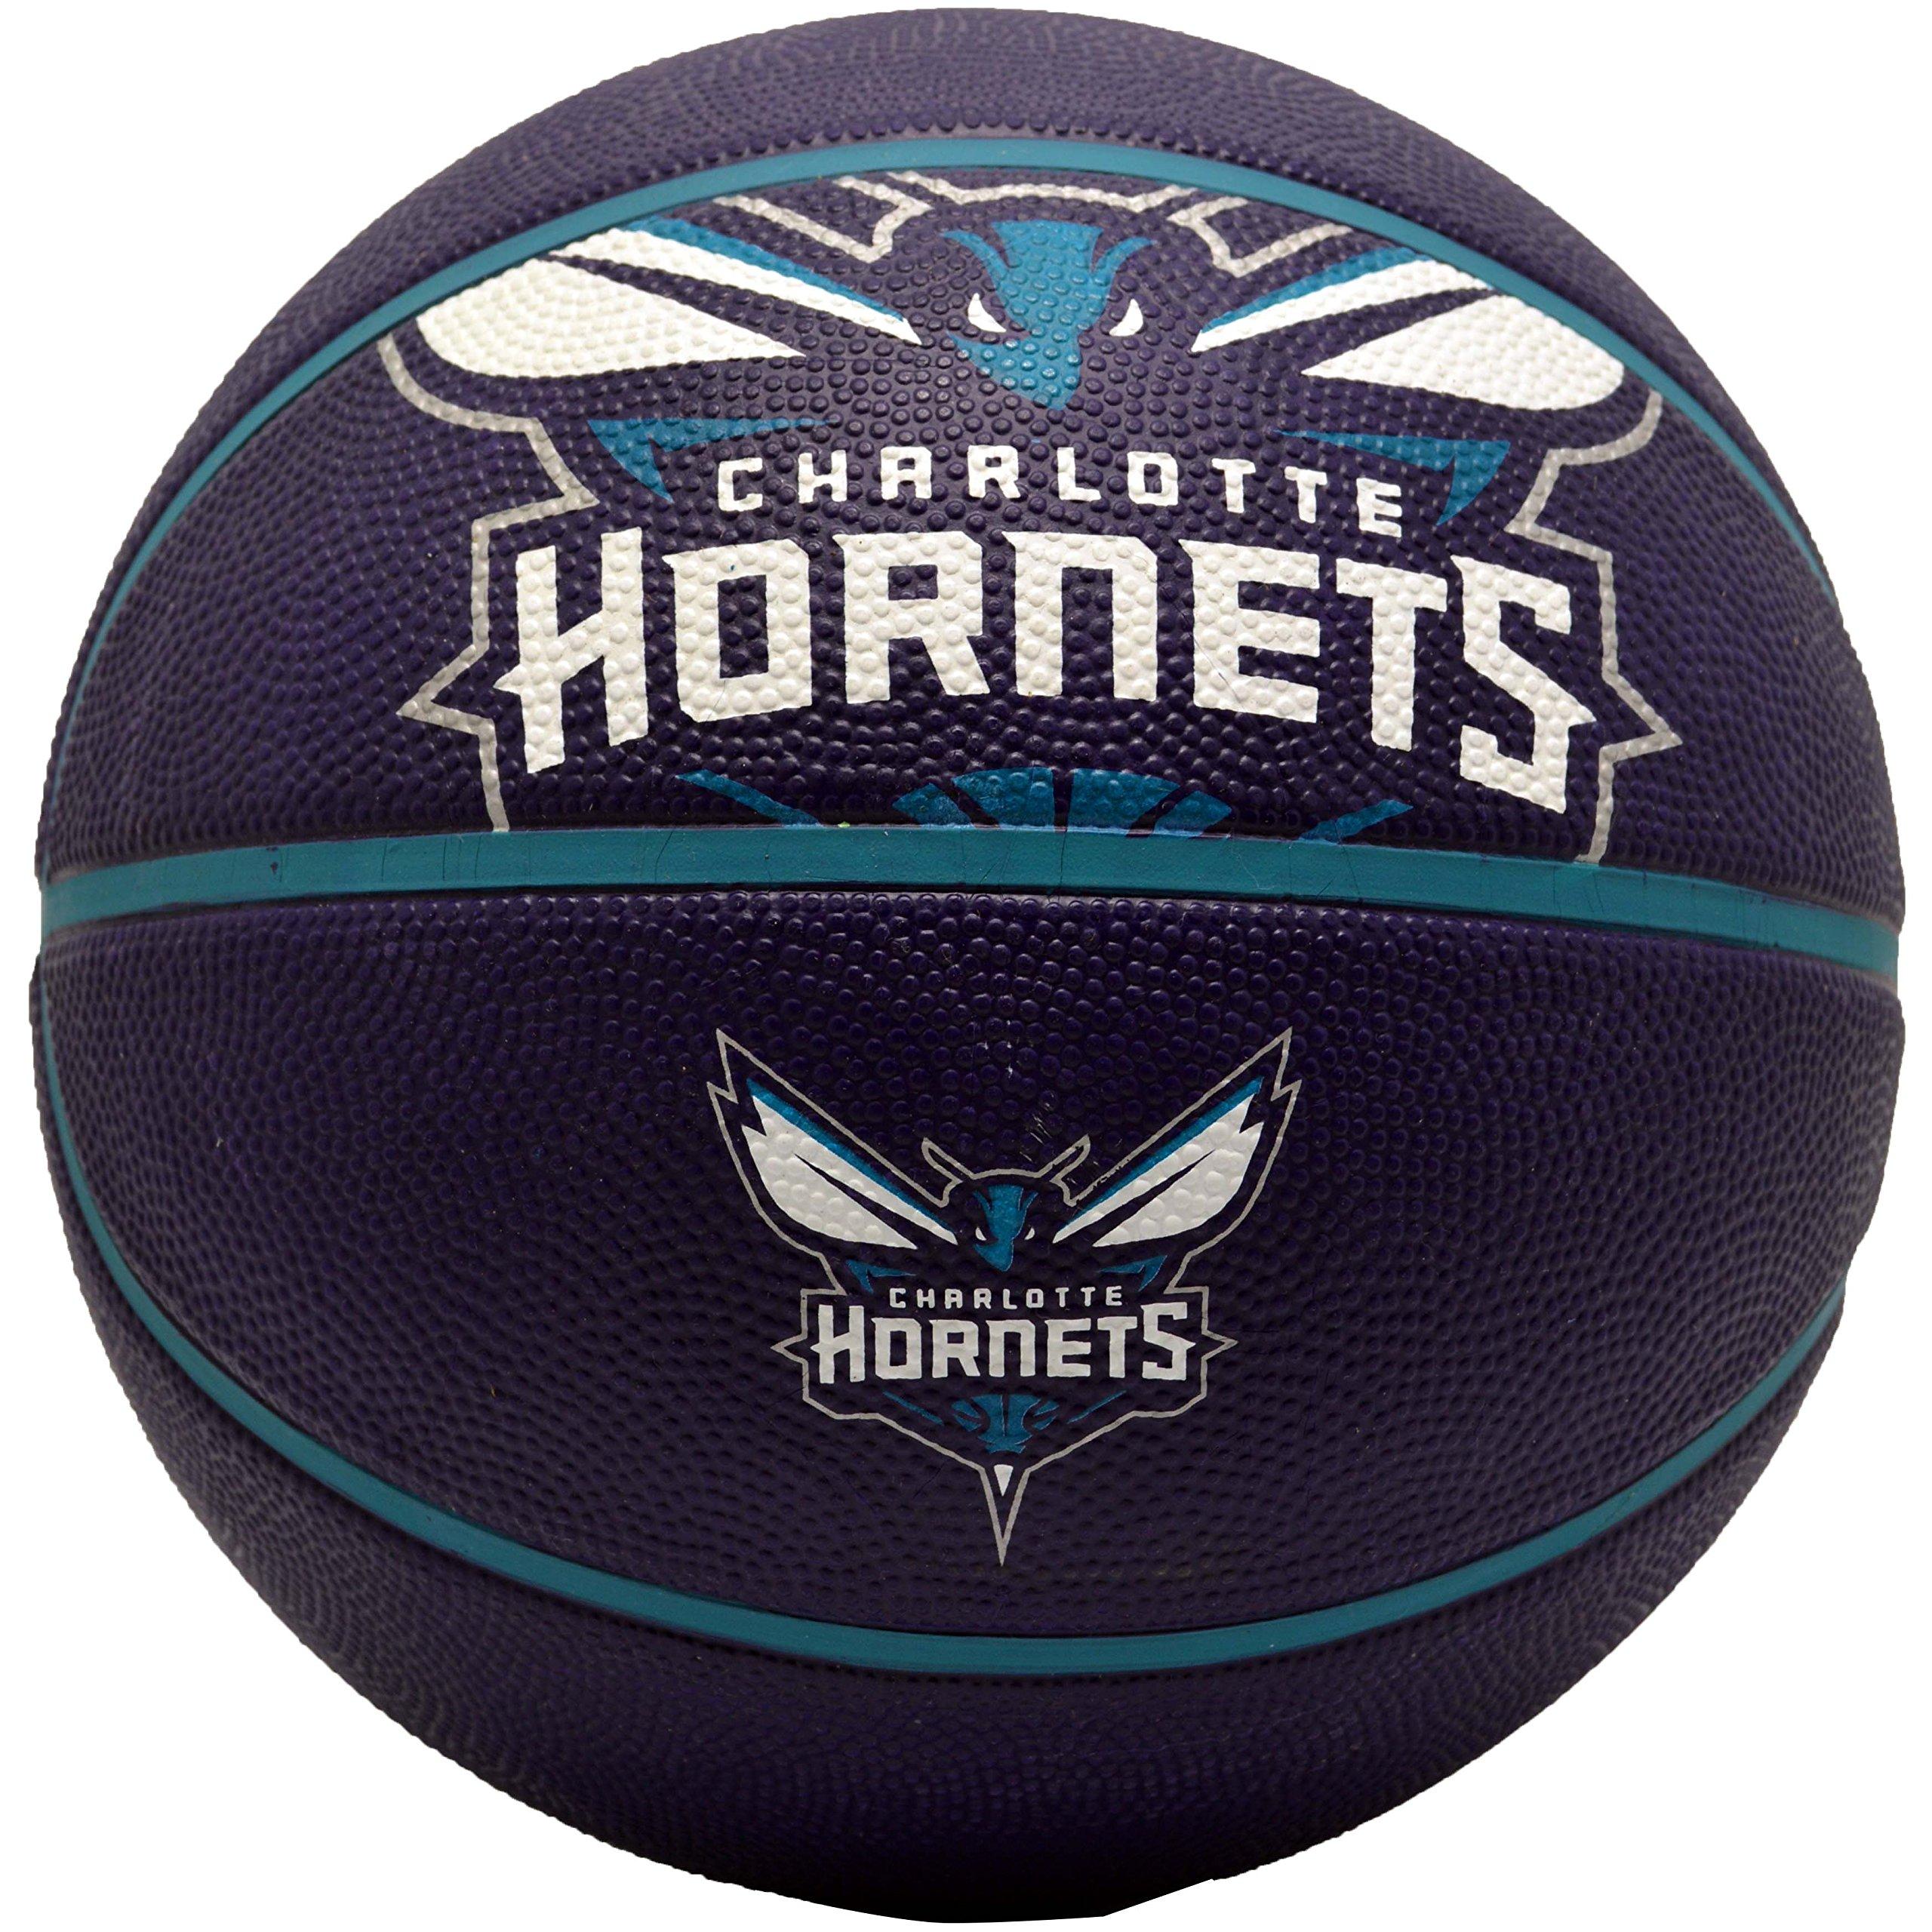 Spalding Charlotte Hornets Rubber Basketball by Spalding